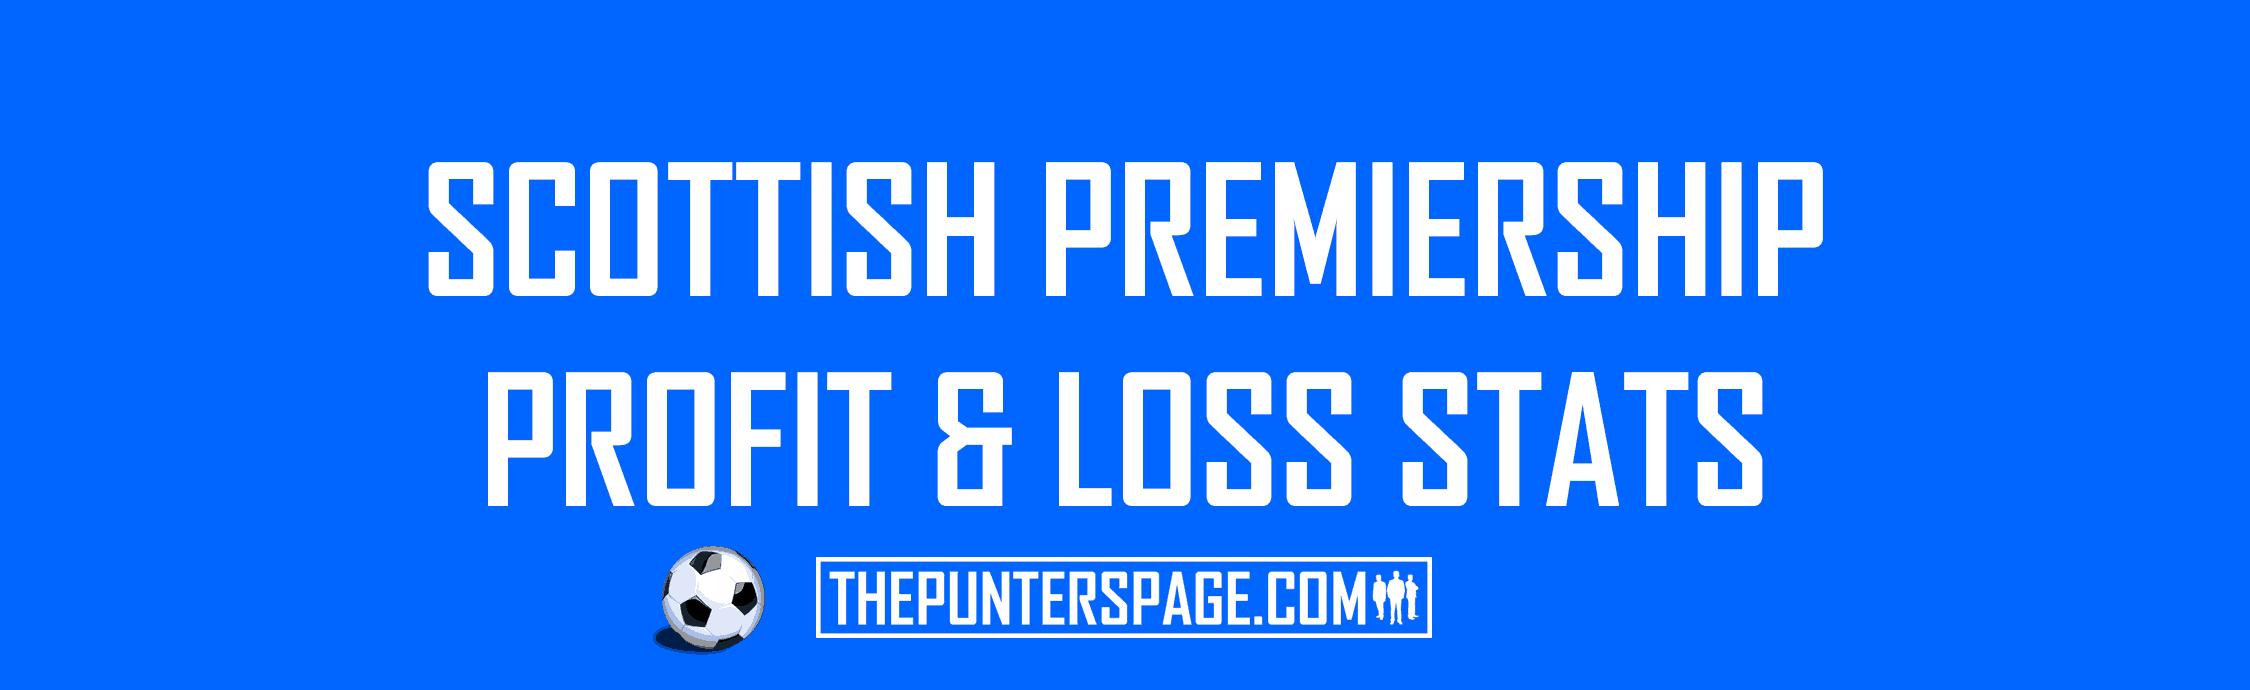 Scottish Premiership Profit & Loss Statistics